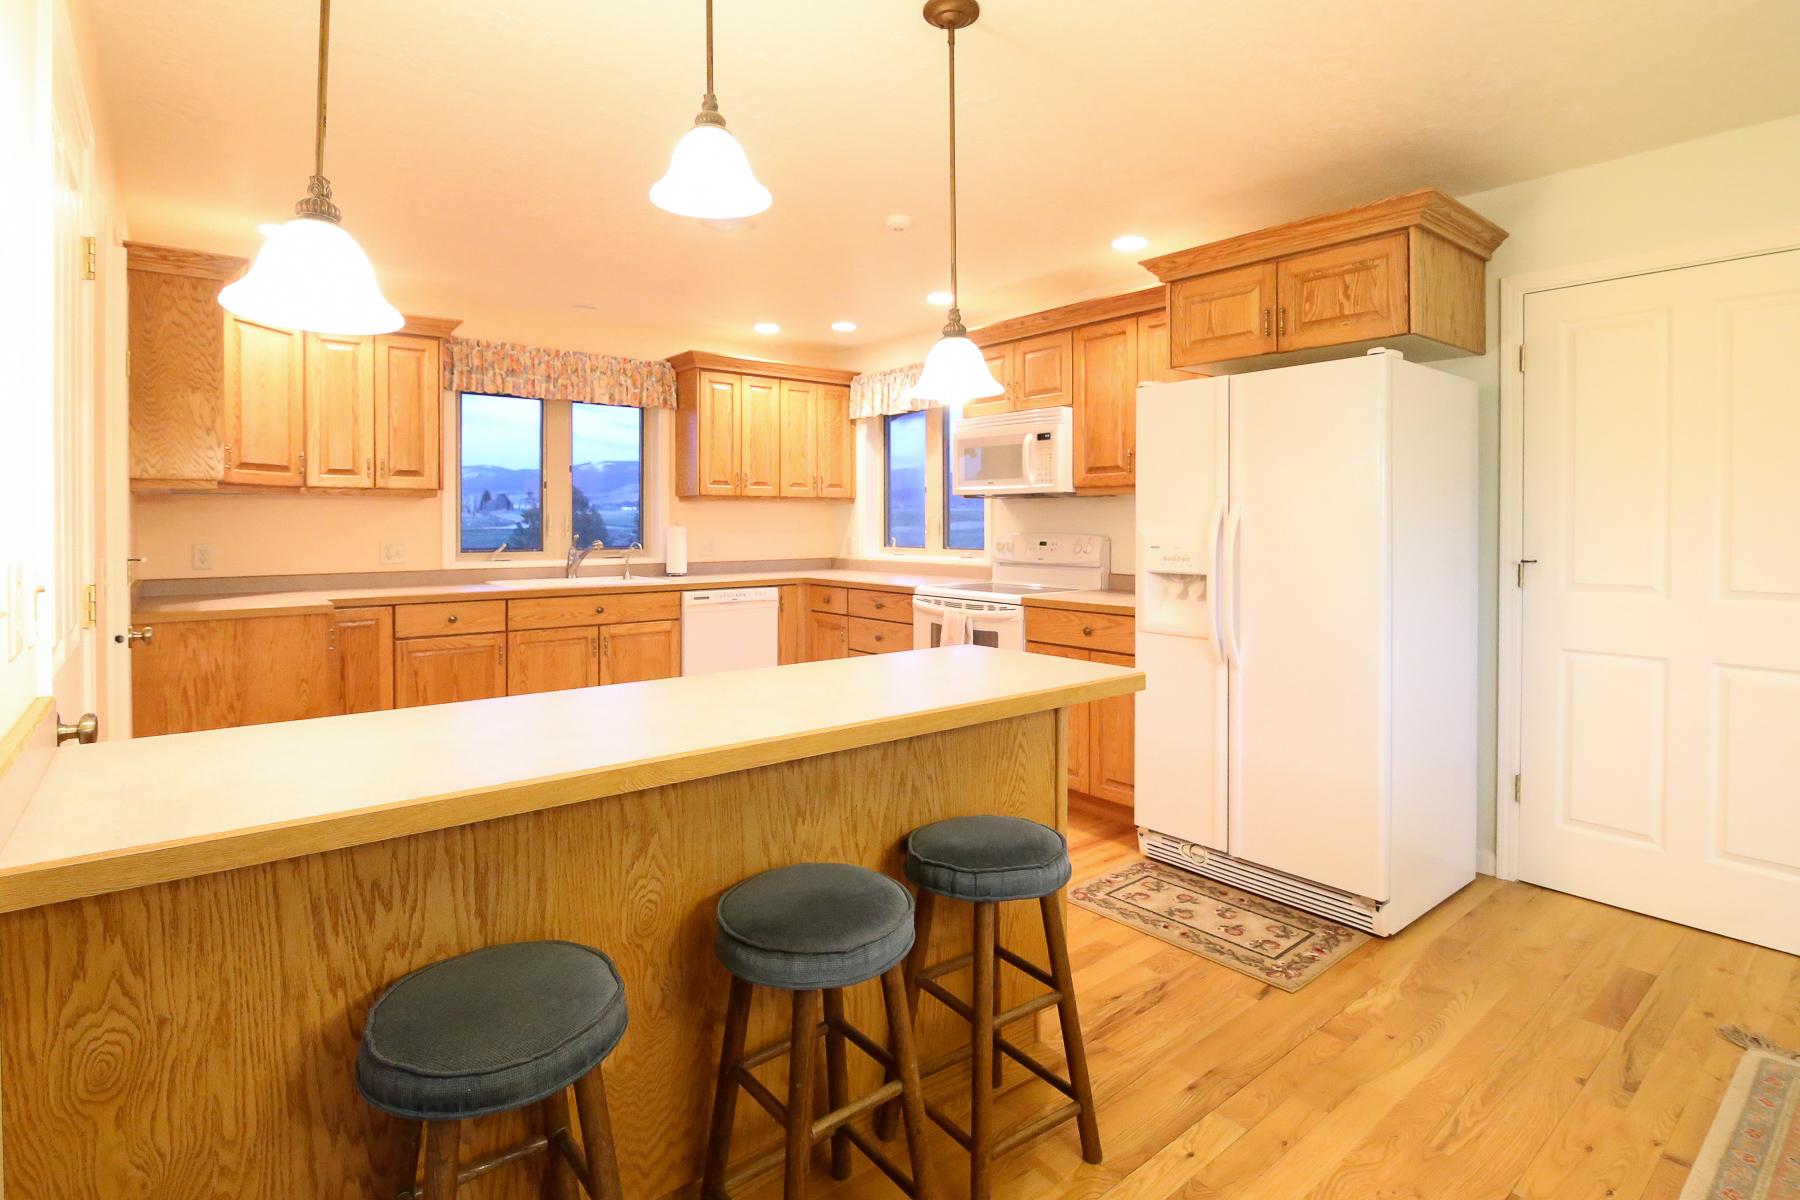 Additional photo for property listing at 449 Ridge View Rd , Stevensville, MT 59870 449  Ridge View Rd Stevensville, Montana 59870 United States